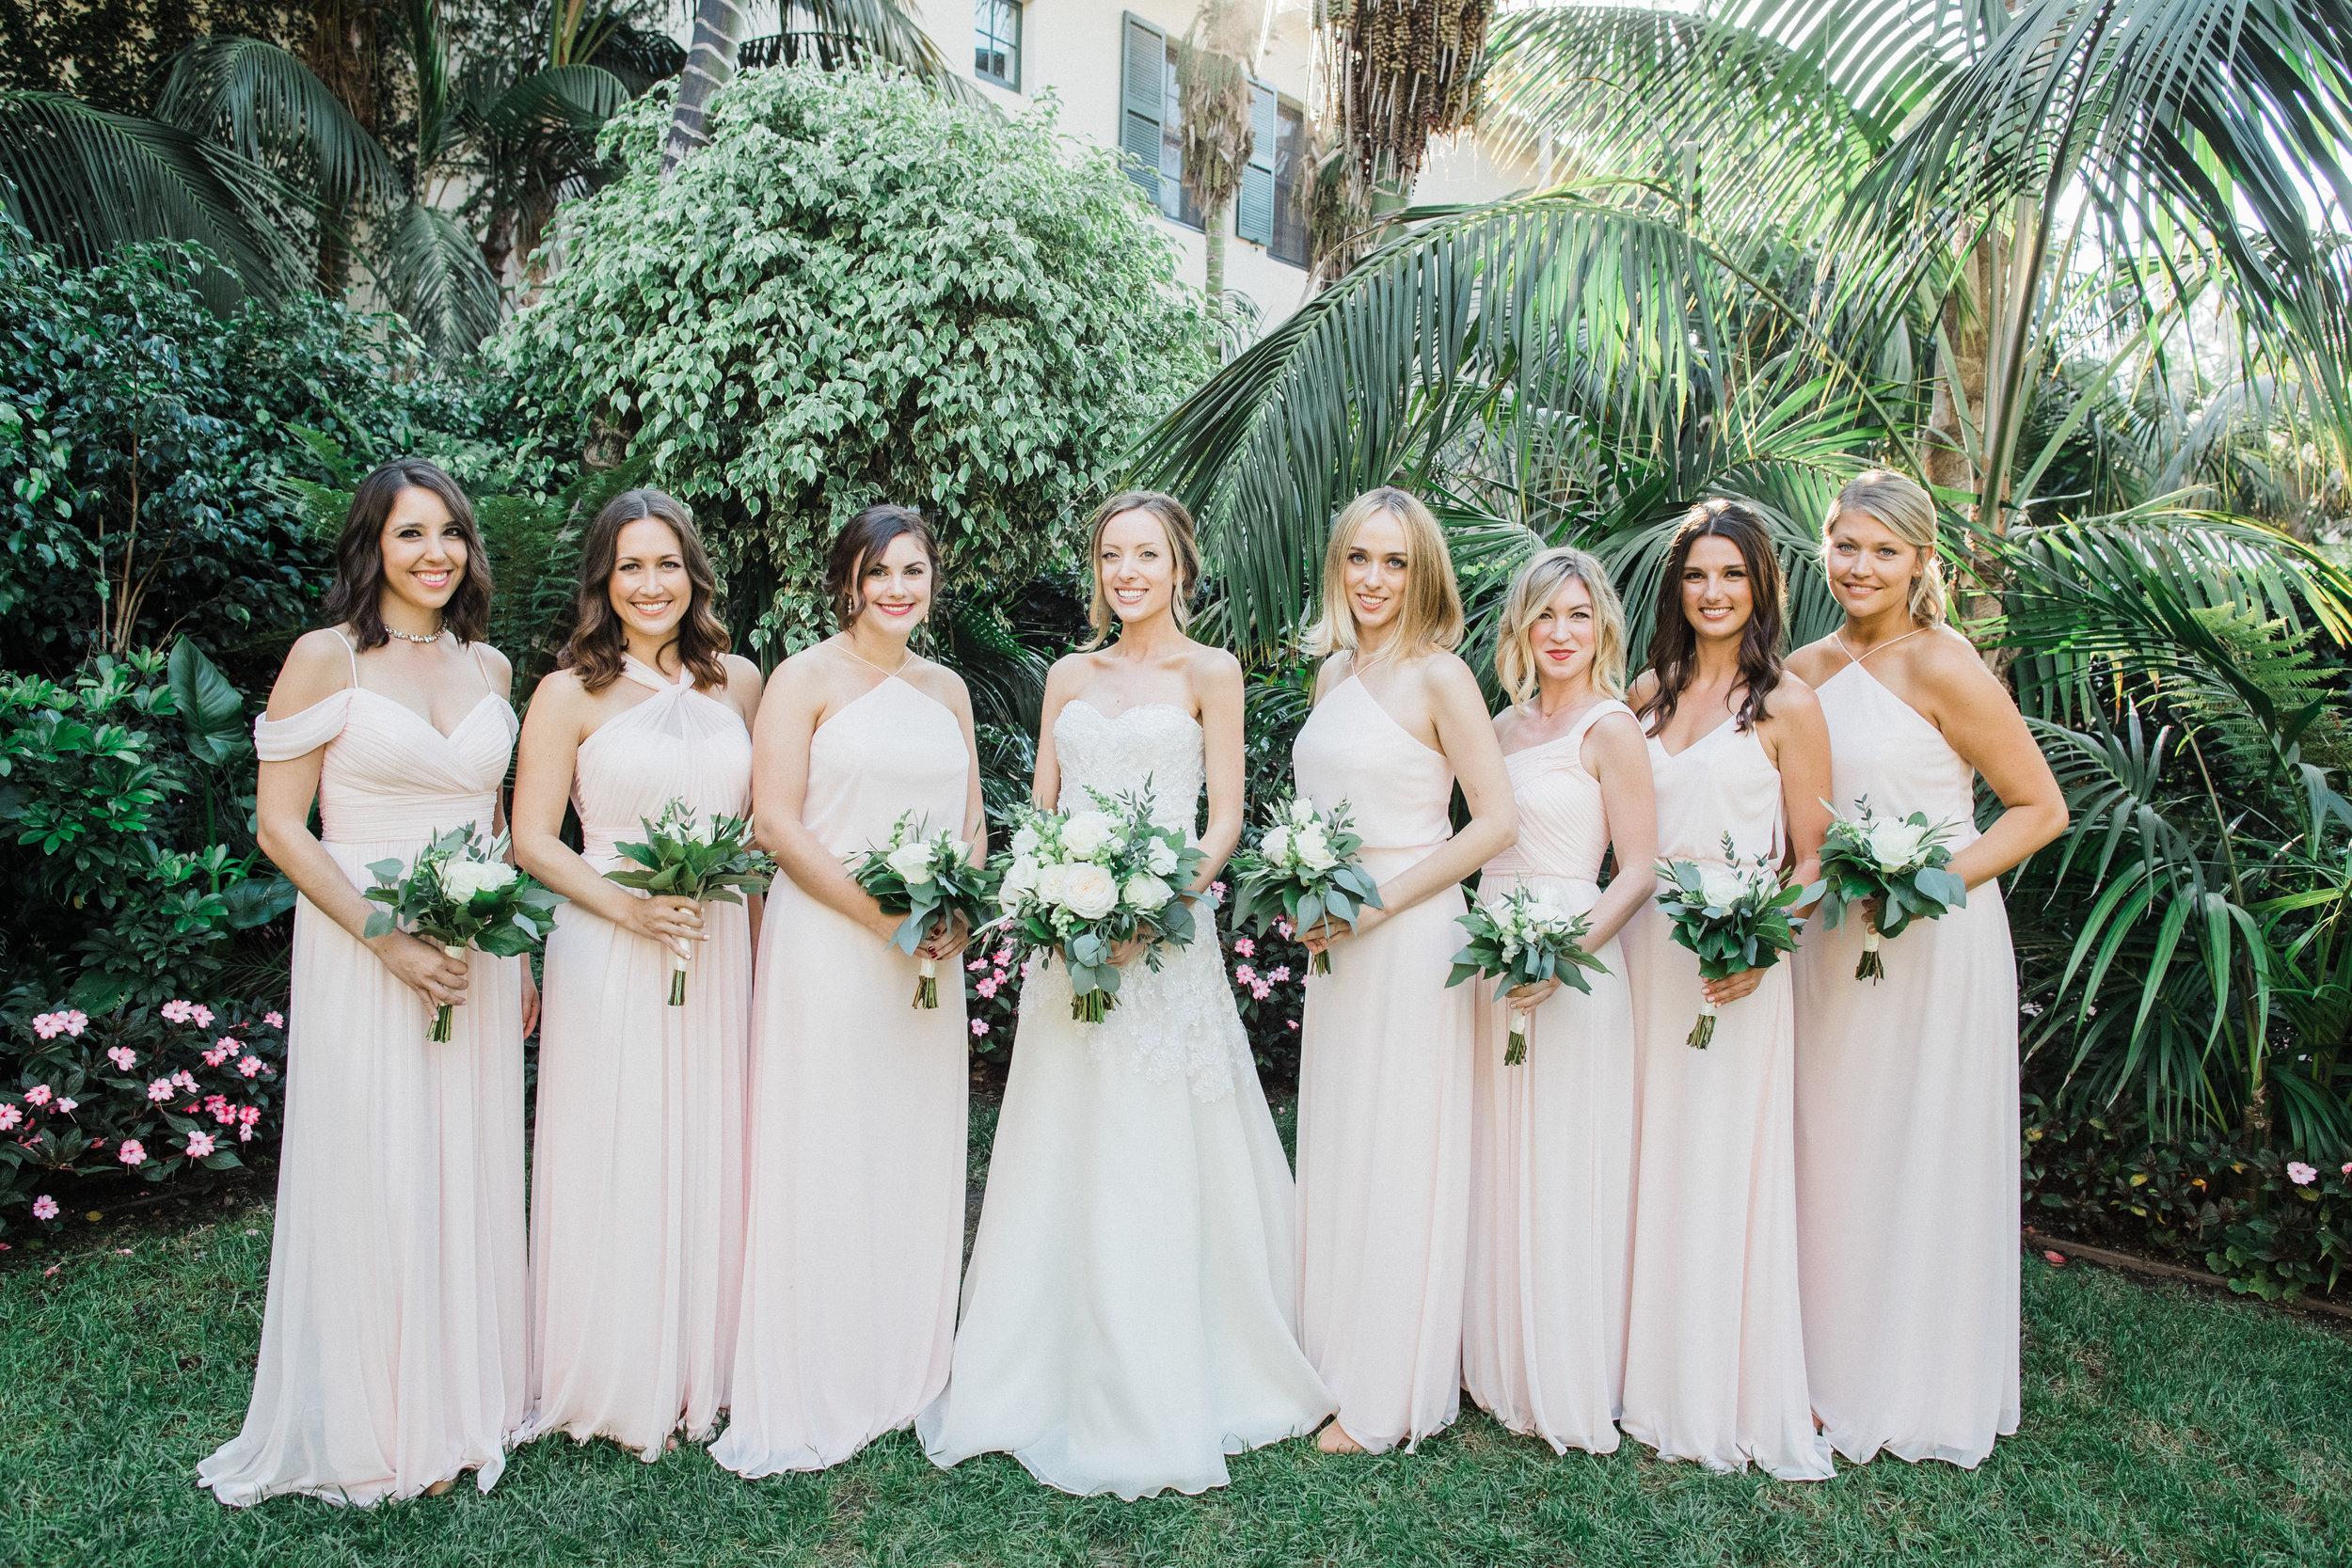 www.santabarbarawedding.com | KB Events | Michael and Anna Costa | Four Seasons The Biltmore | Bridesmaids